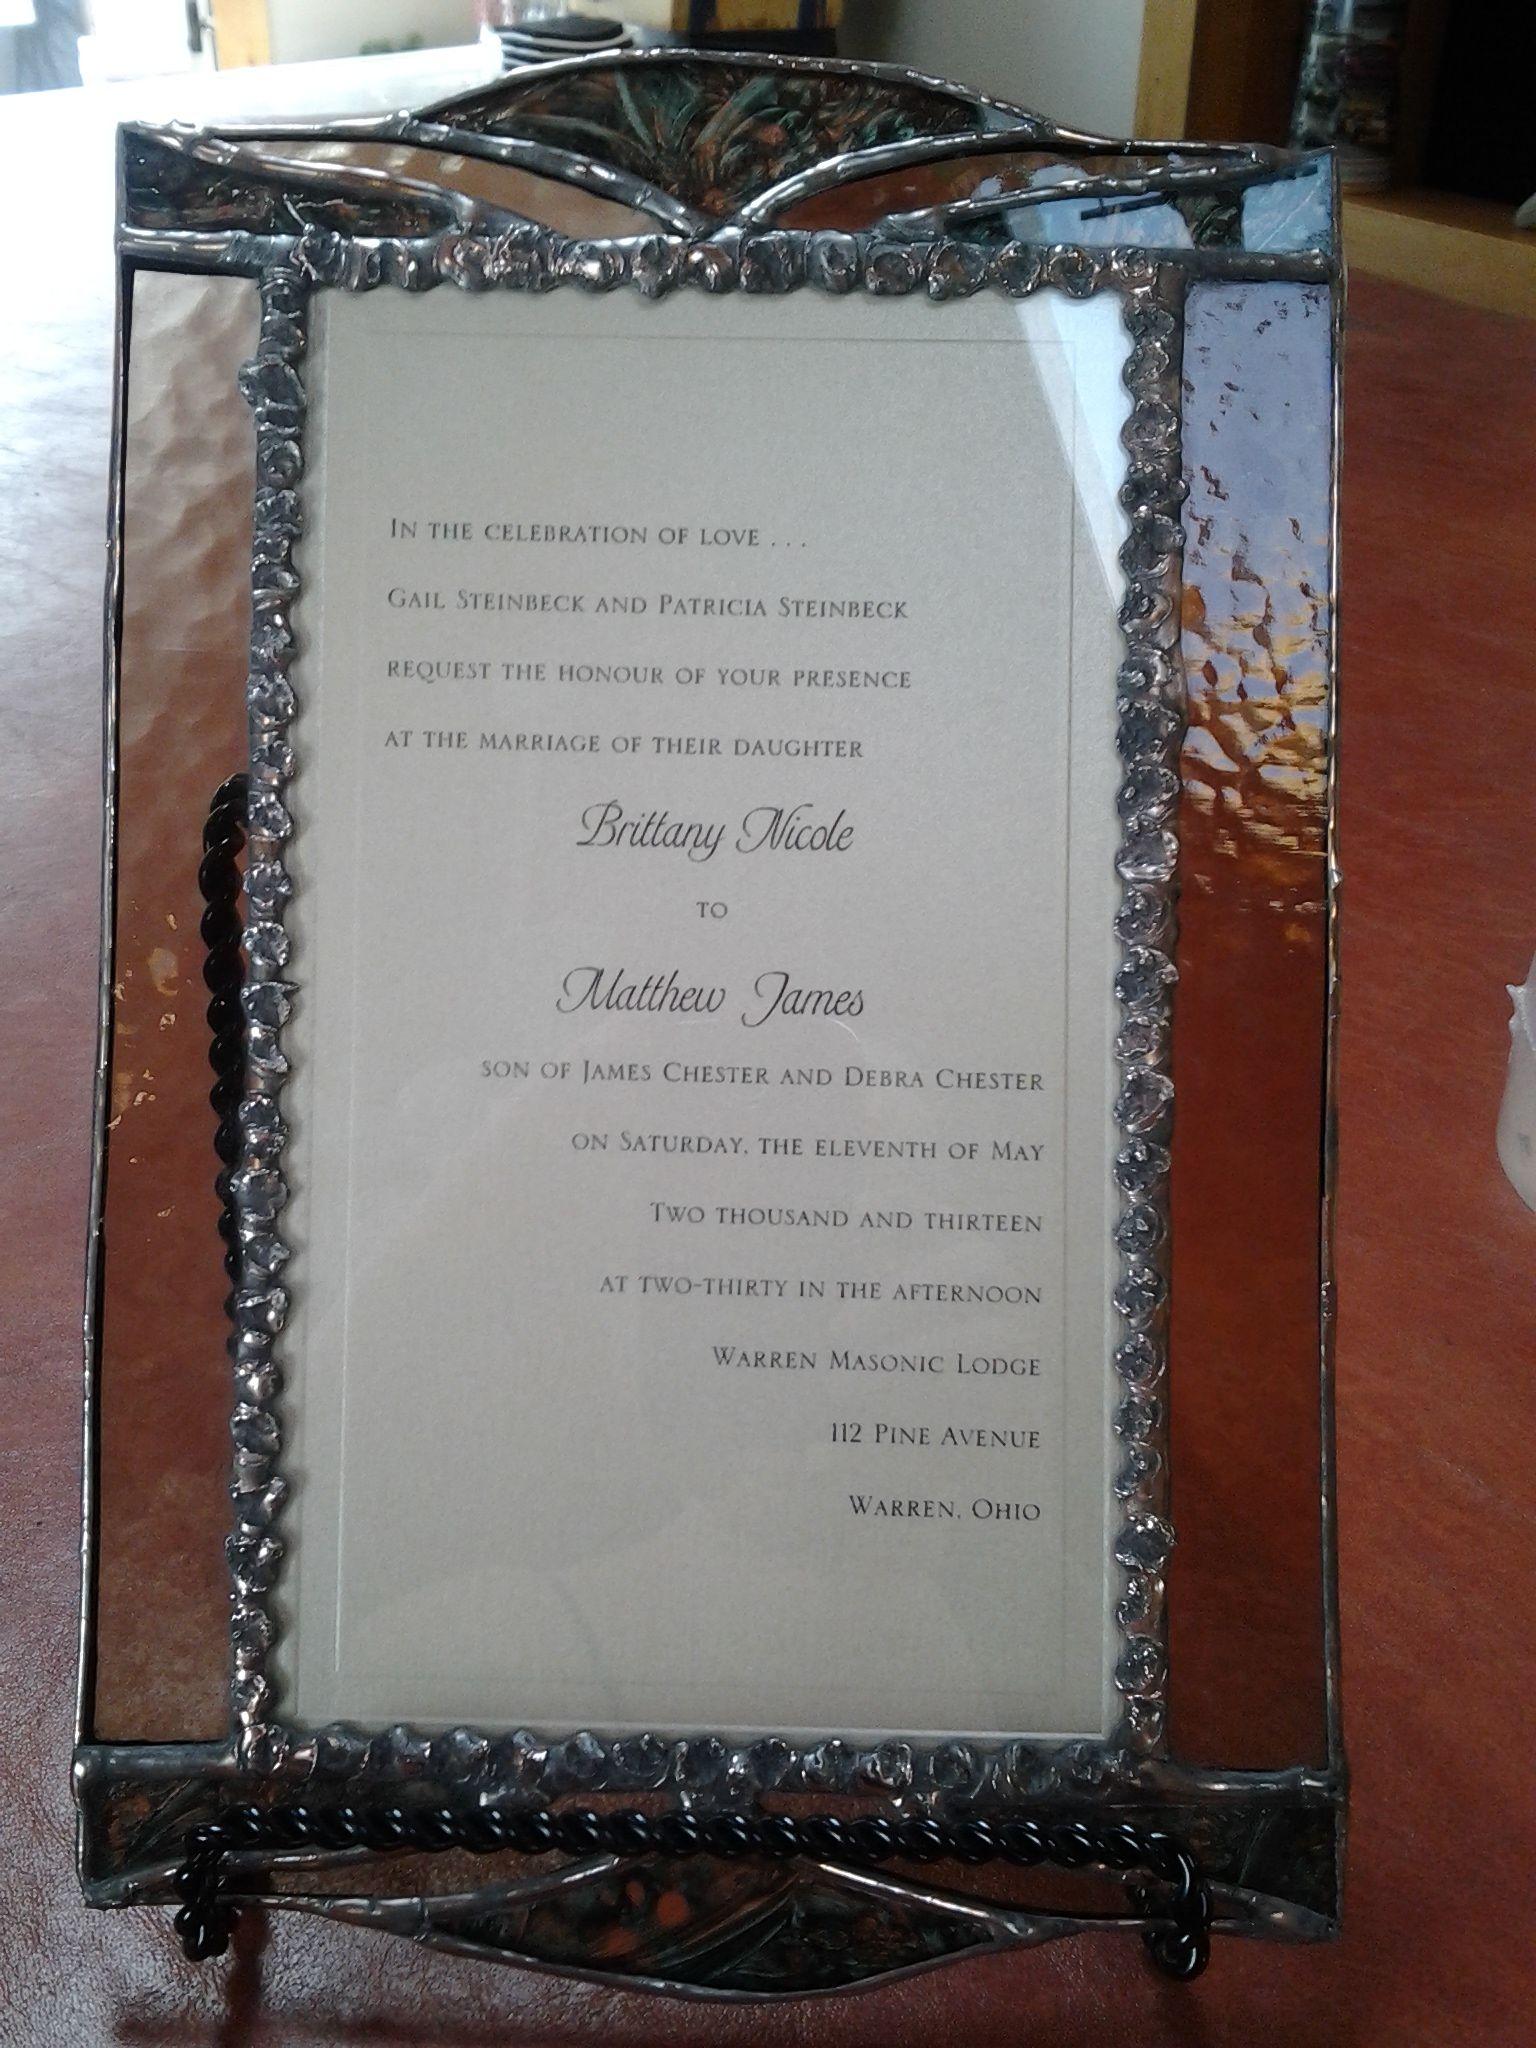 Keepsake Wedding Invitation, enclosed in glass!